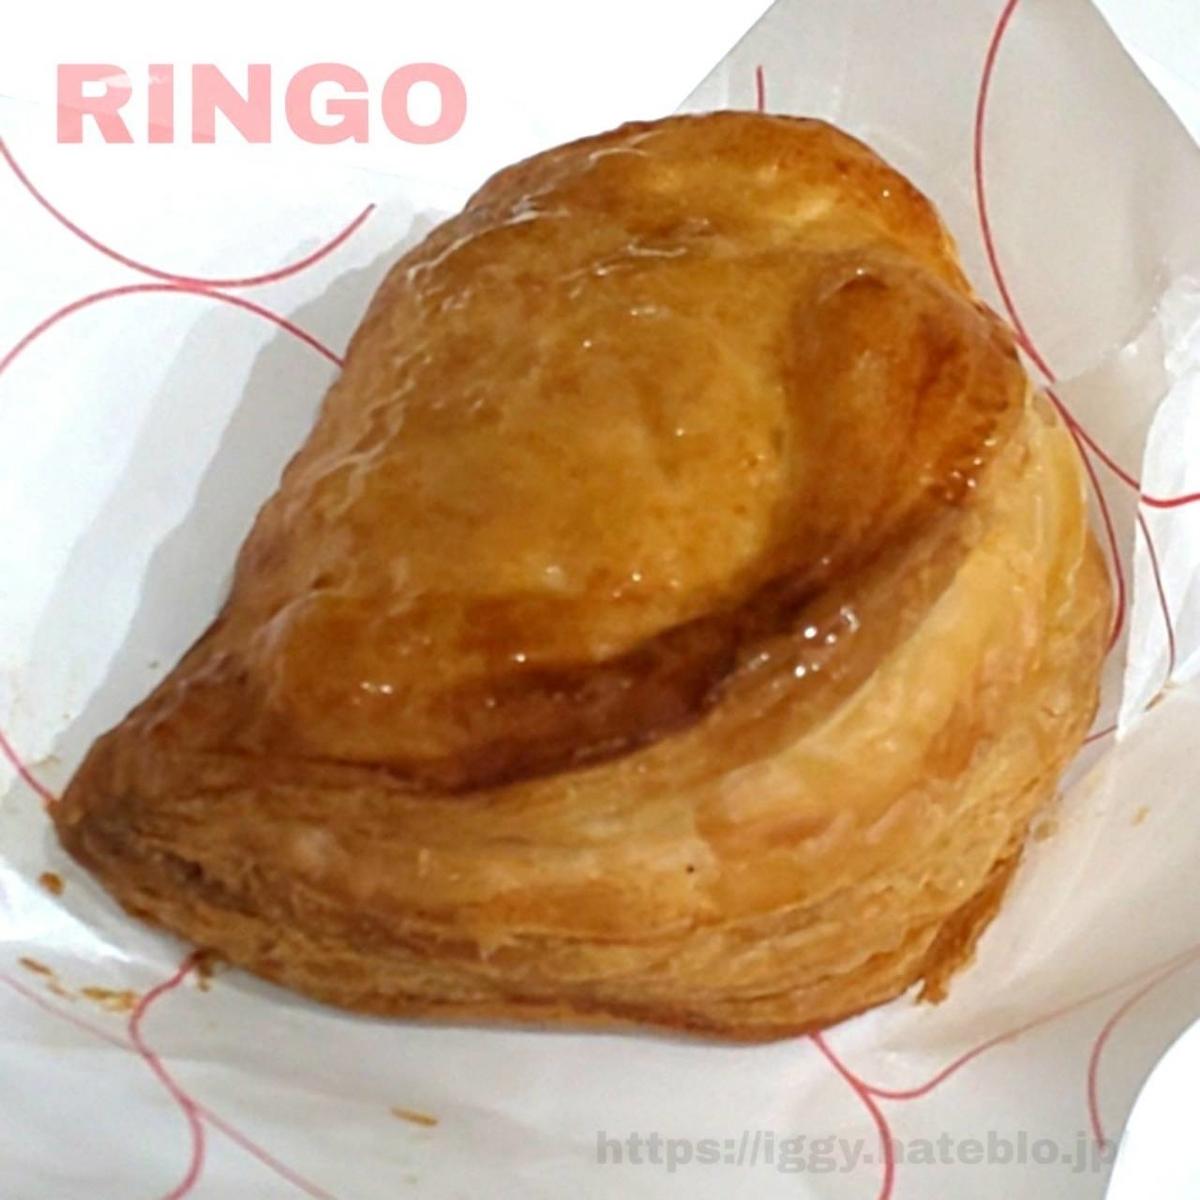 RINGO アップルパイ① iggy2019